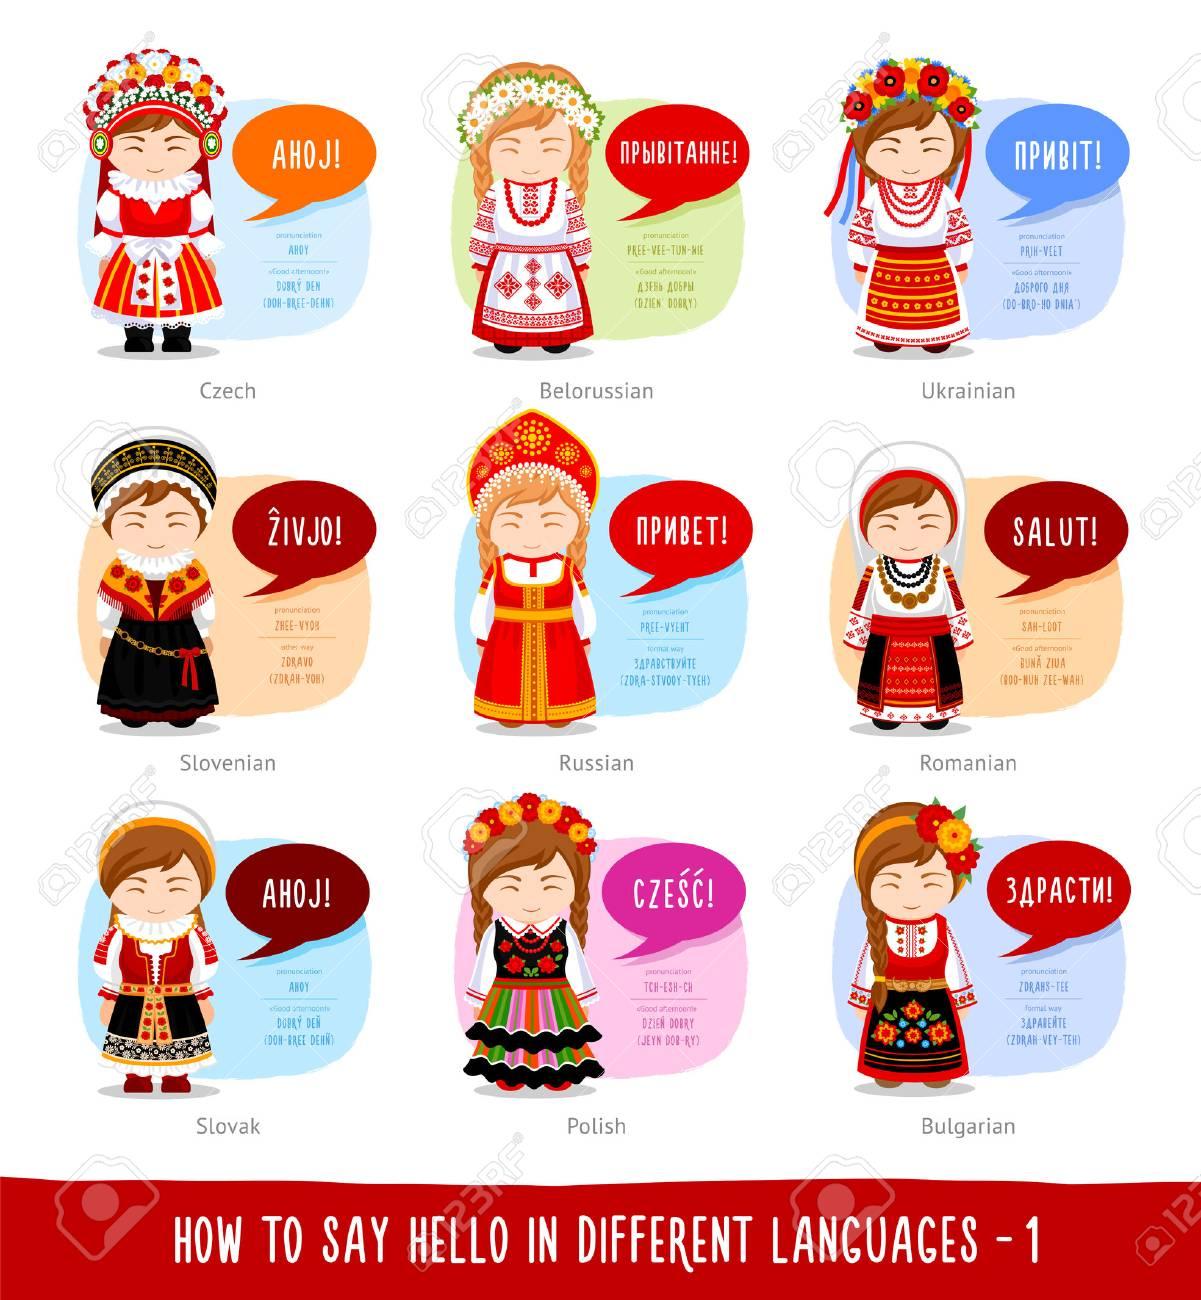 Hello in foreign languages: Russian, Belarusian, Ukrainian, Slovenian, Slovak, Polish, Czech, Romanian, Bulgarian. - 97572689